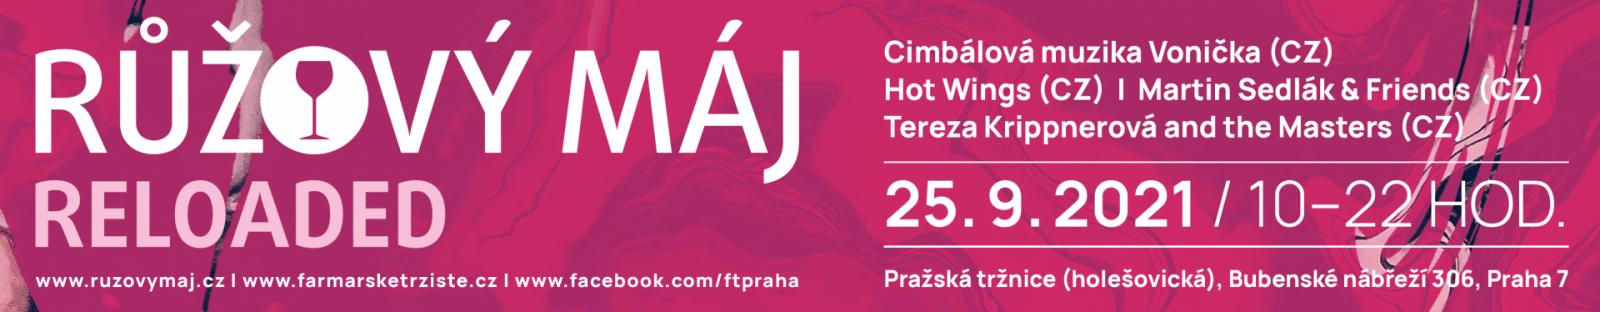 https://www.farmarsketrziste.cz/wp-content/uploads/rm2021-770x150-web.png